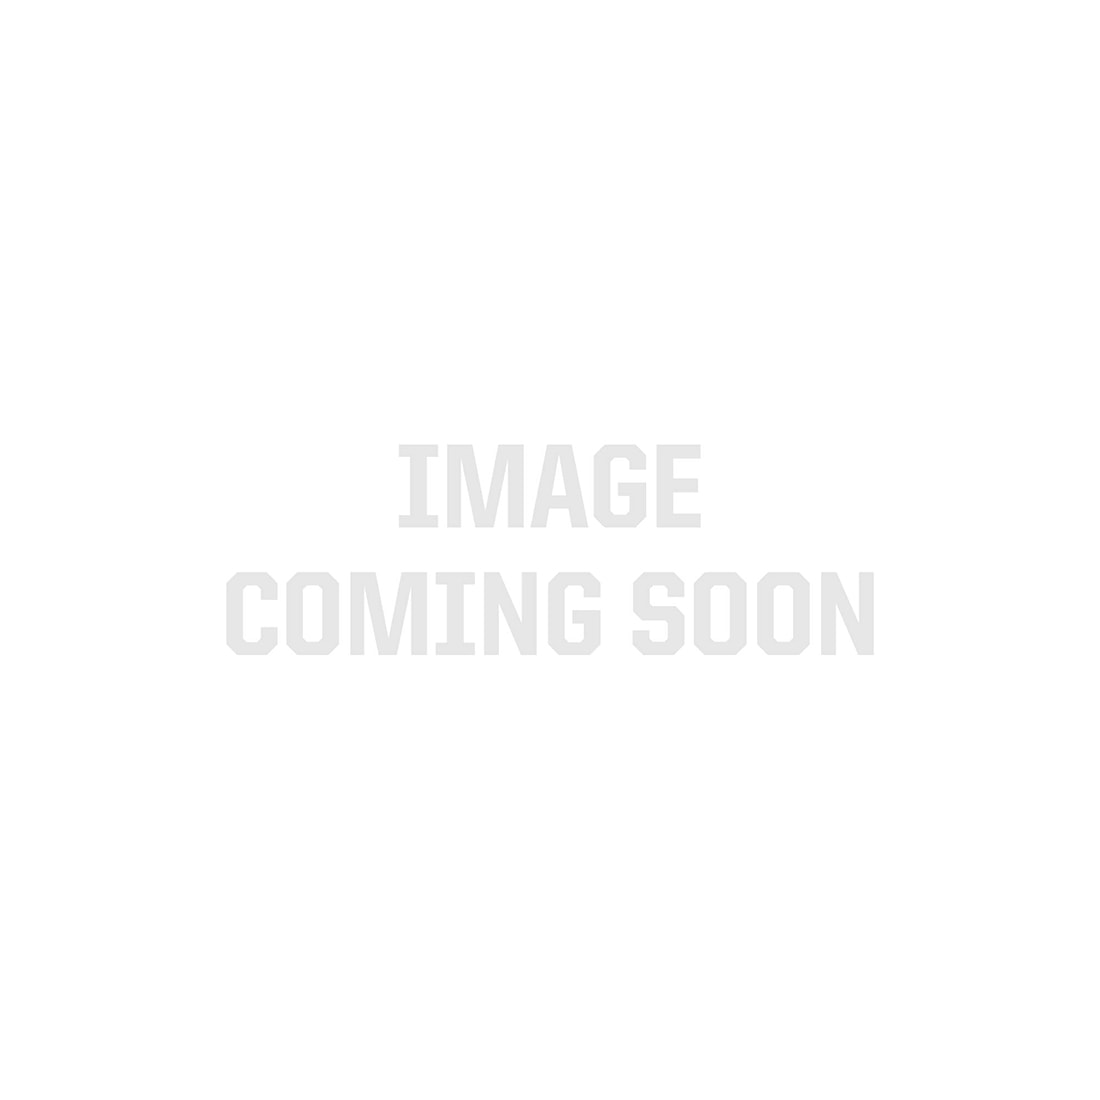 Stick CU4 Sunlite Touch Sensitive Intelligent Control Keypad (Easy Stand Alone DMX Controller)